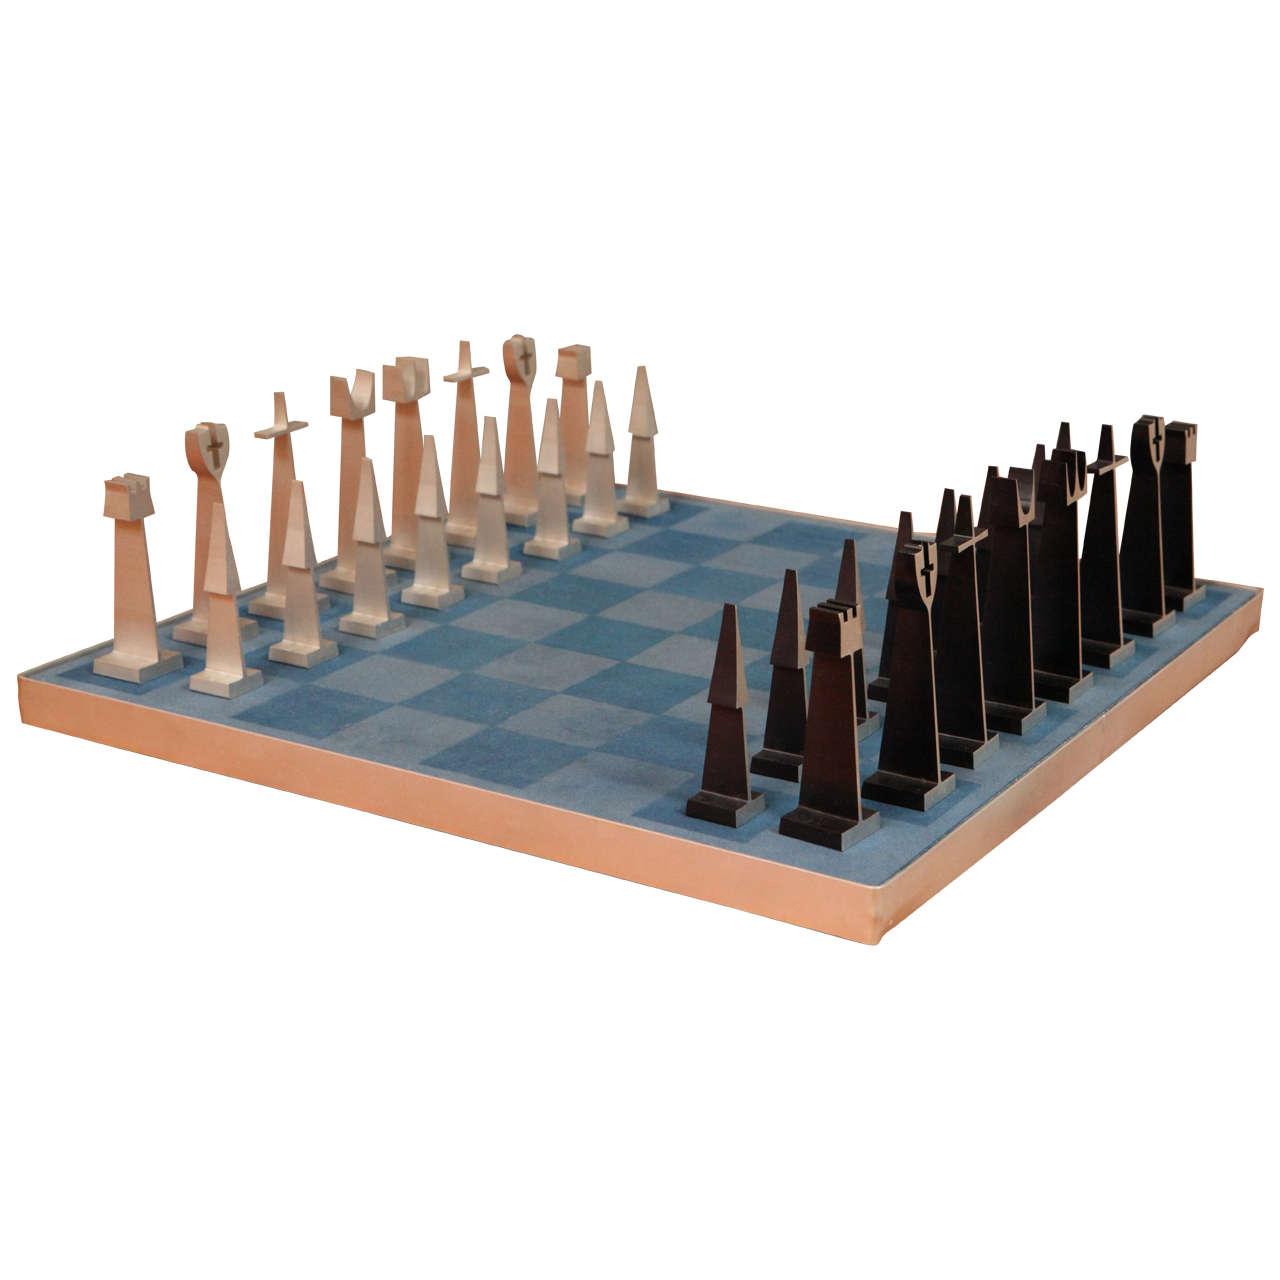 Austin Enterprises Aluminum Chess Set and Board